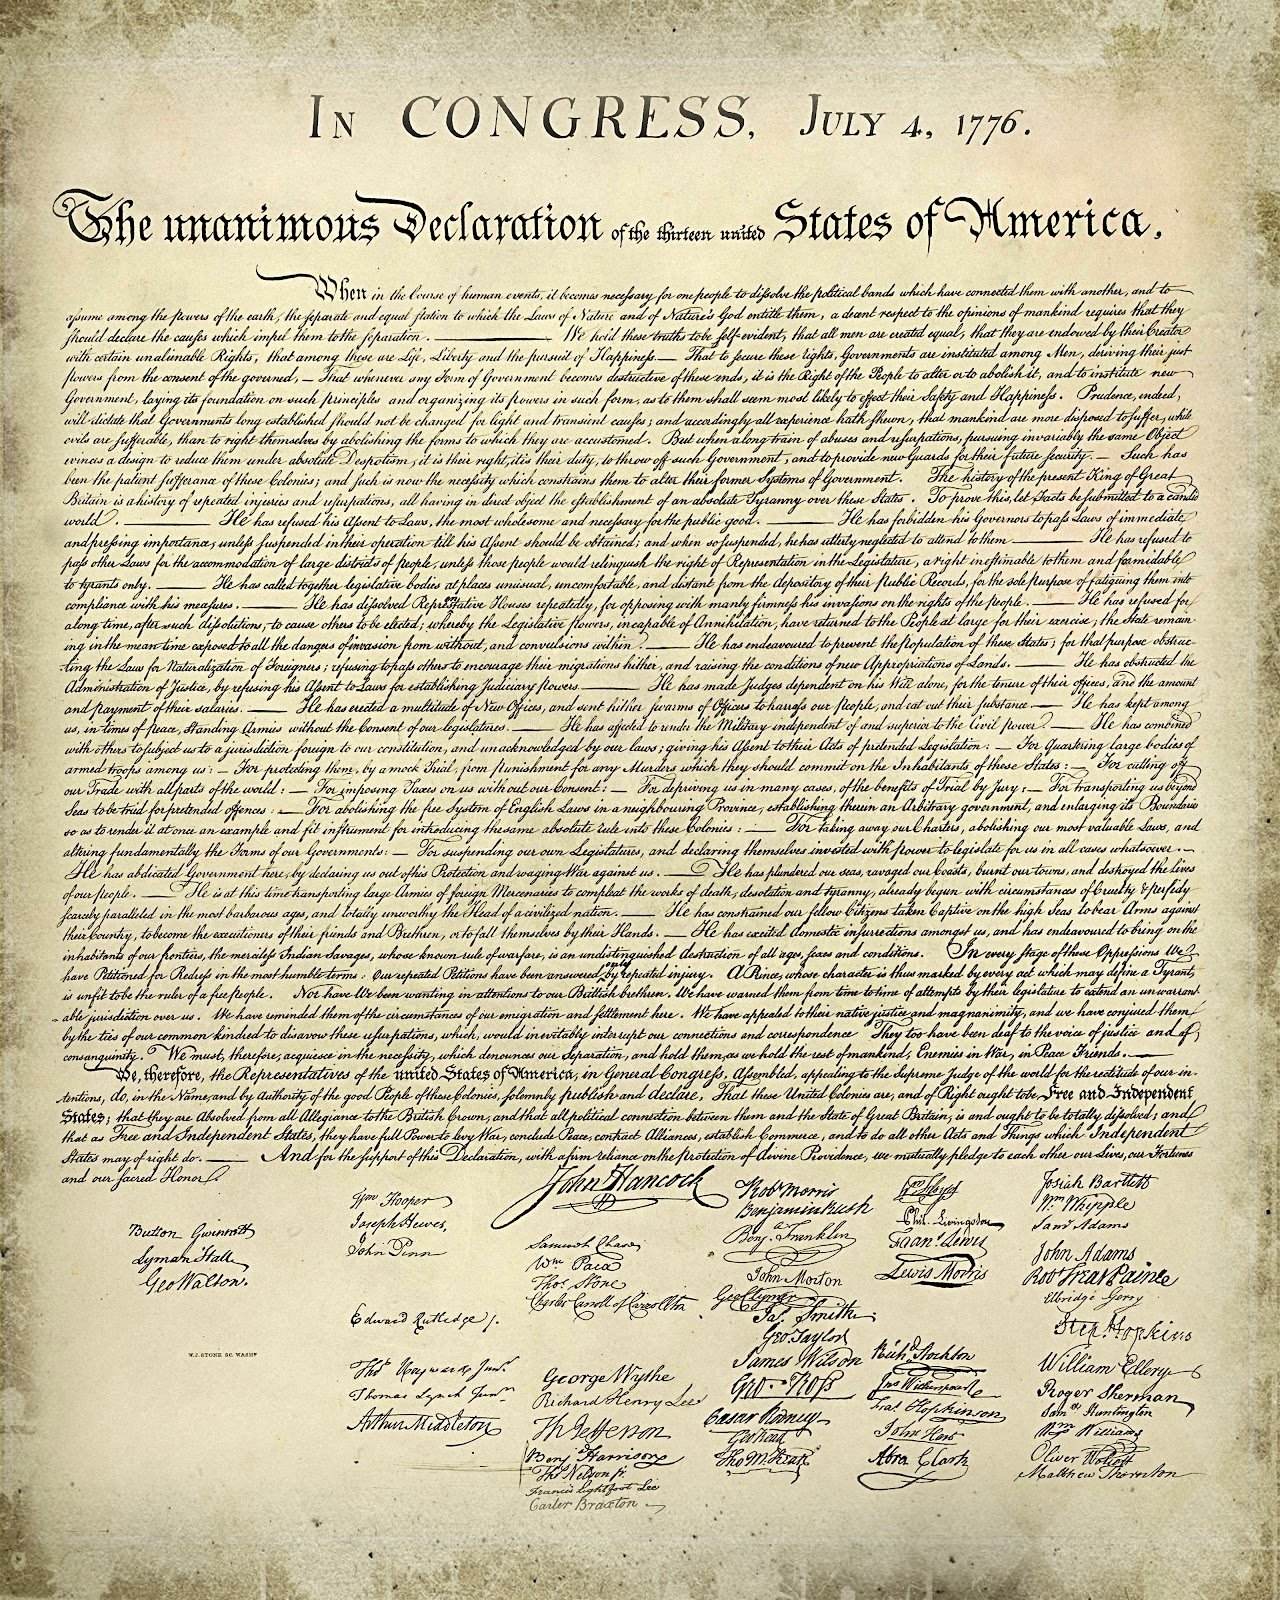 10 Lovable Main Idea Of Declaration Of Independence printable copy declaration independence and simple free 3 2020